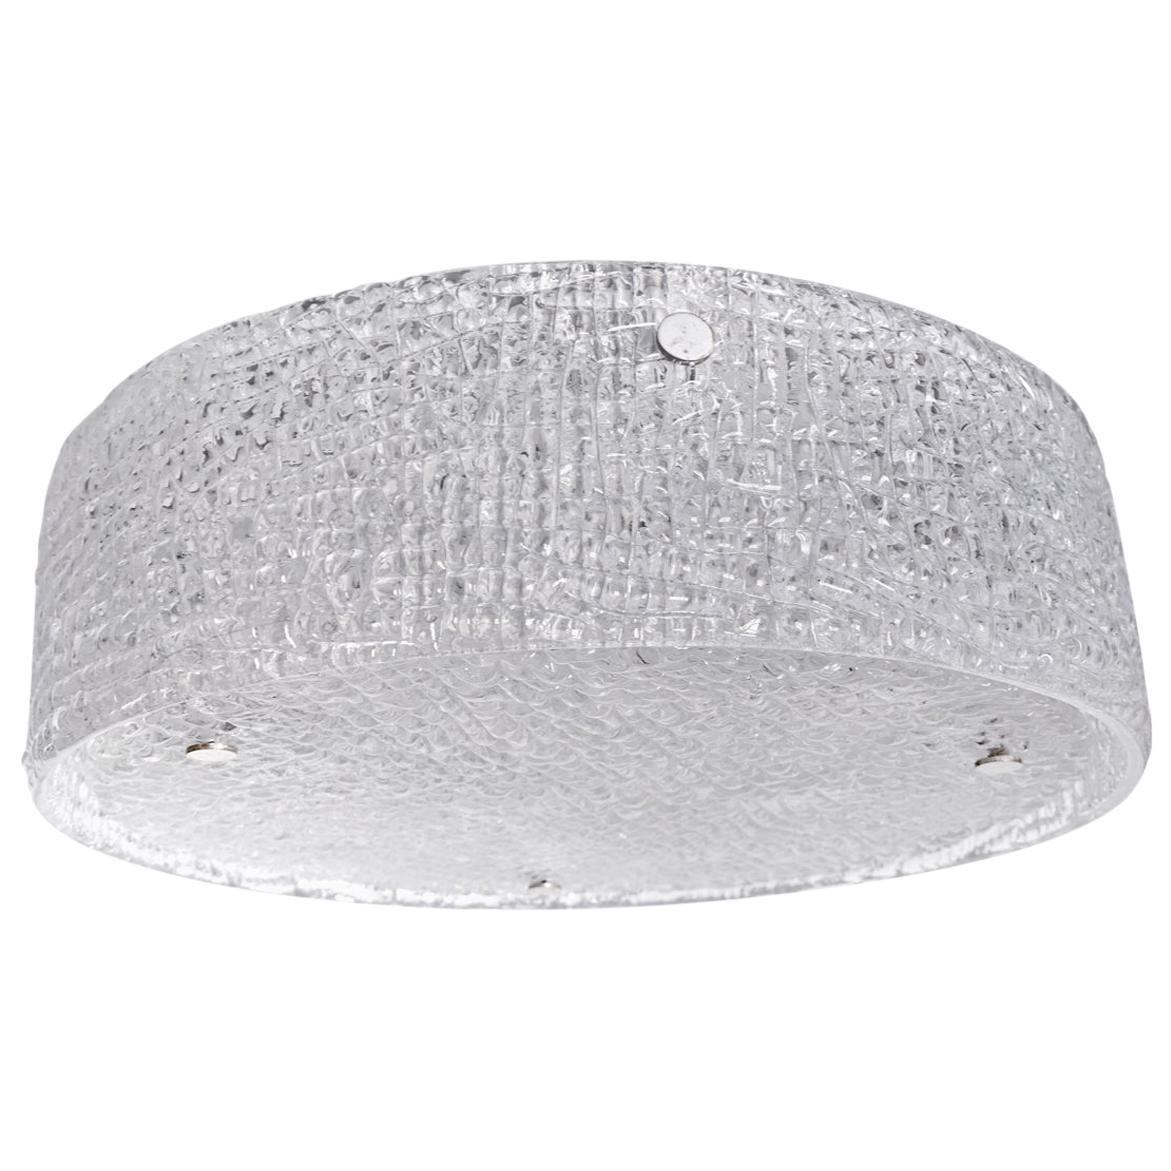 Large German Vintage Textured Murano Glass Ceiling Light Flushmount, 1960s